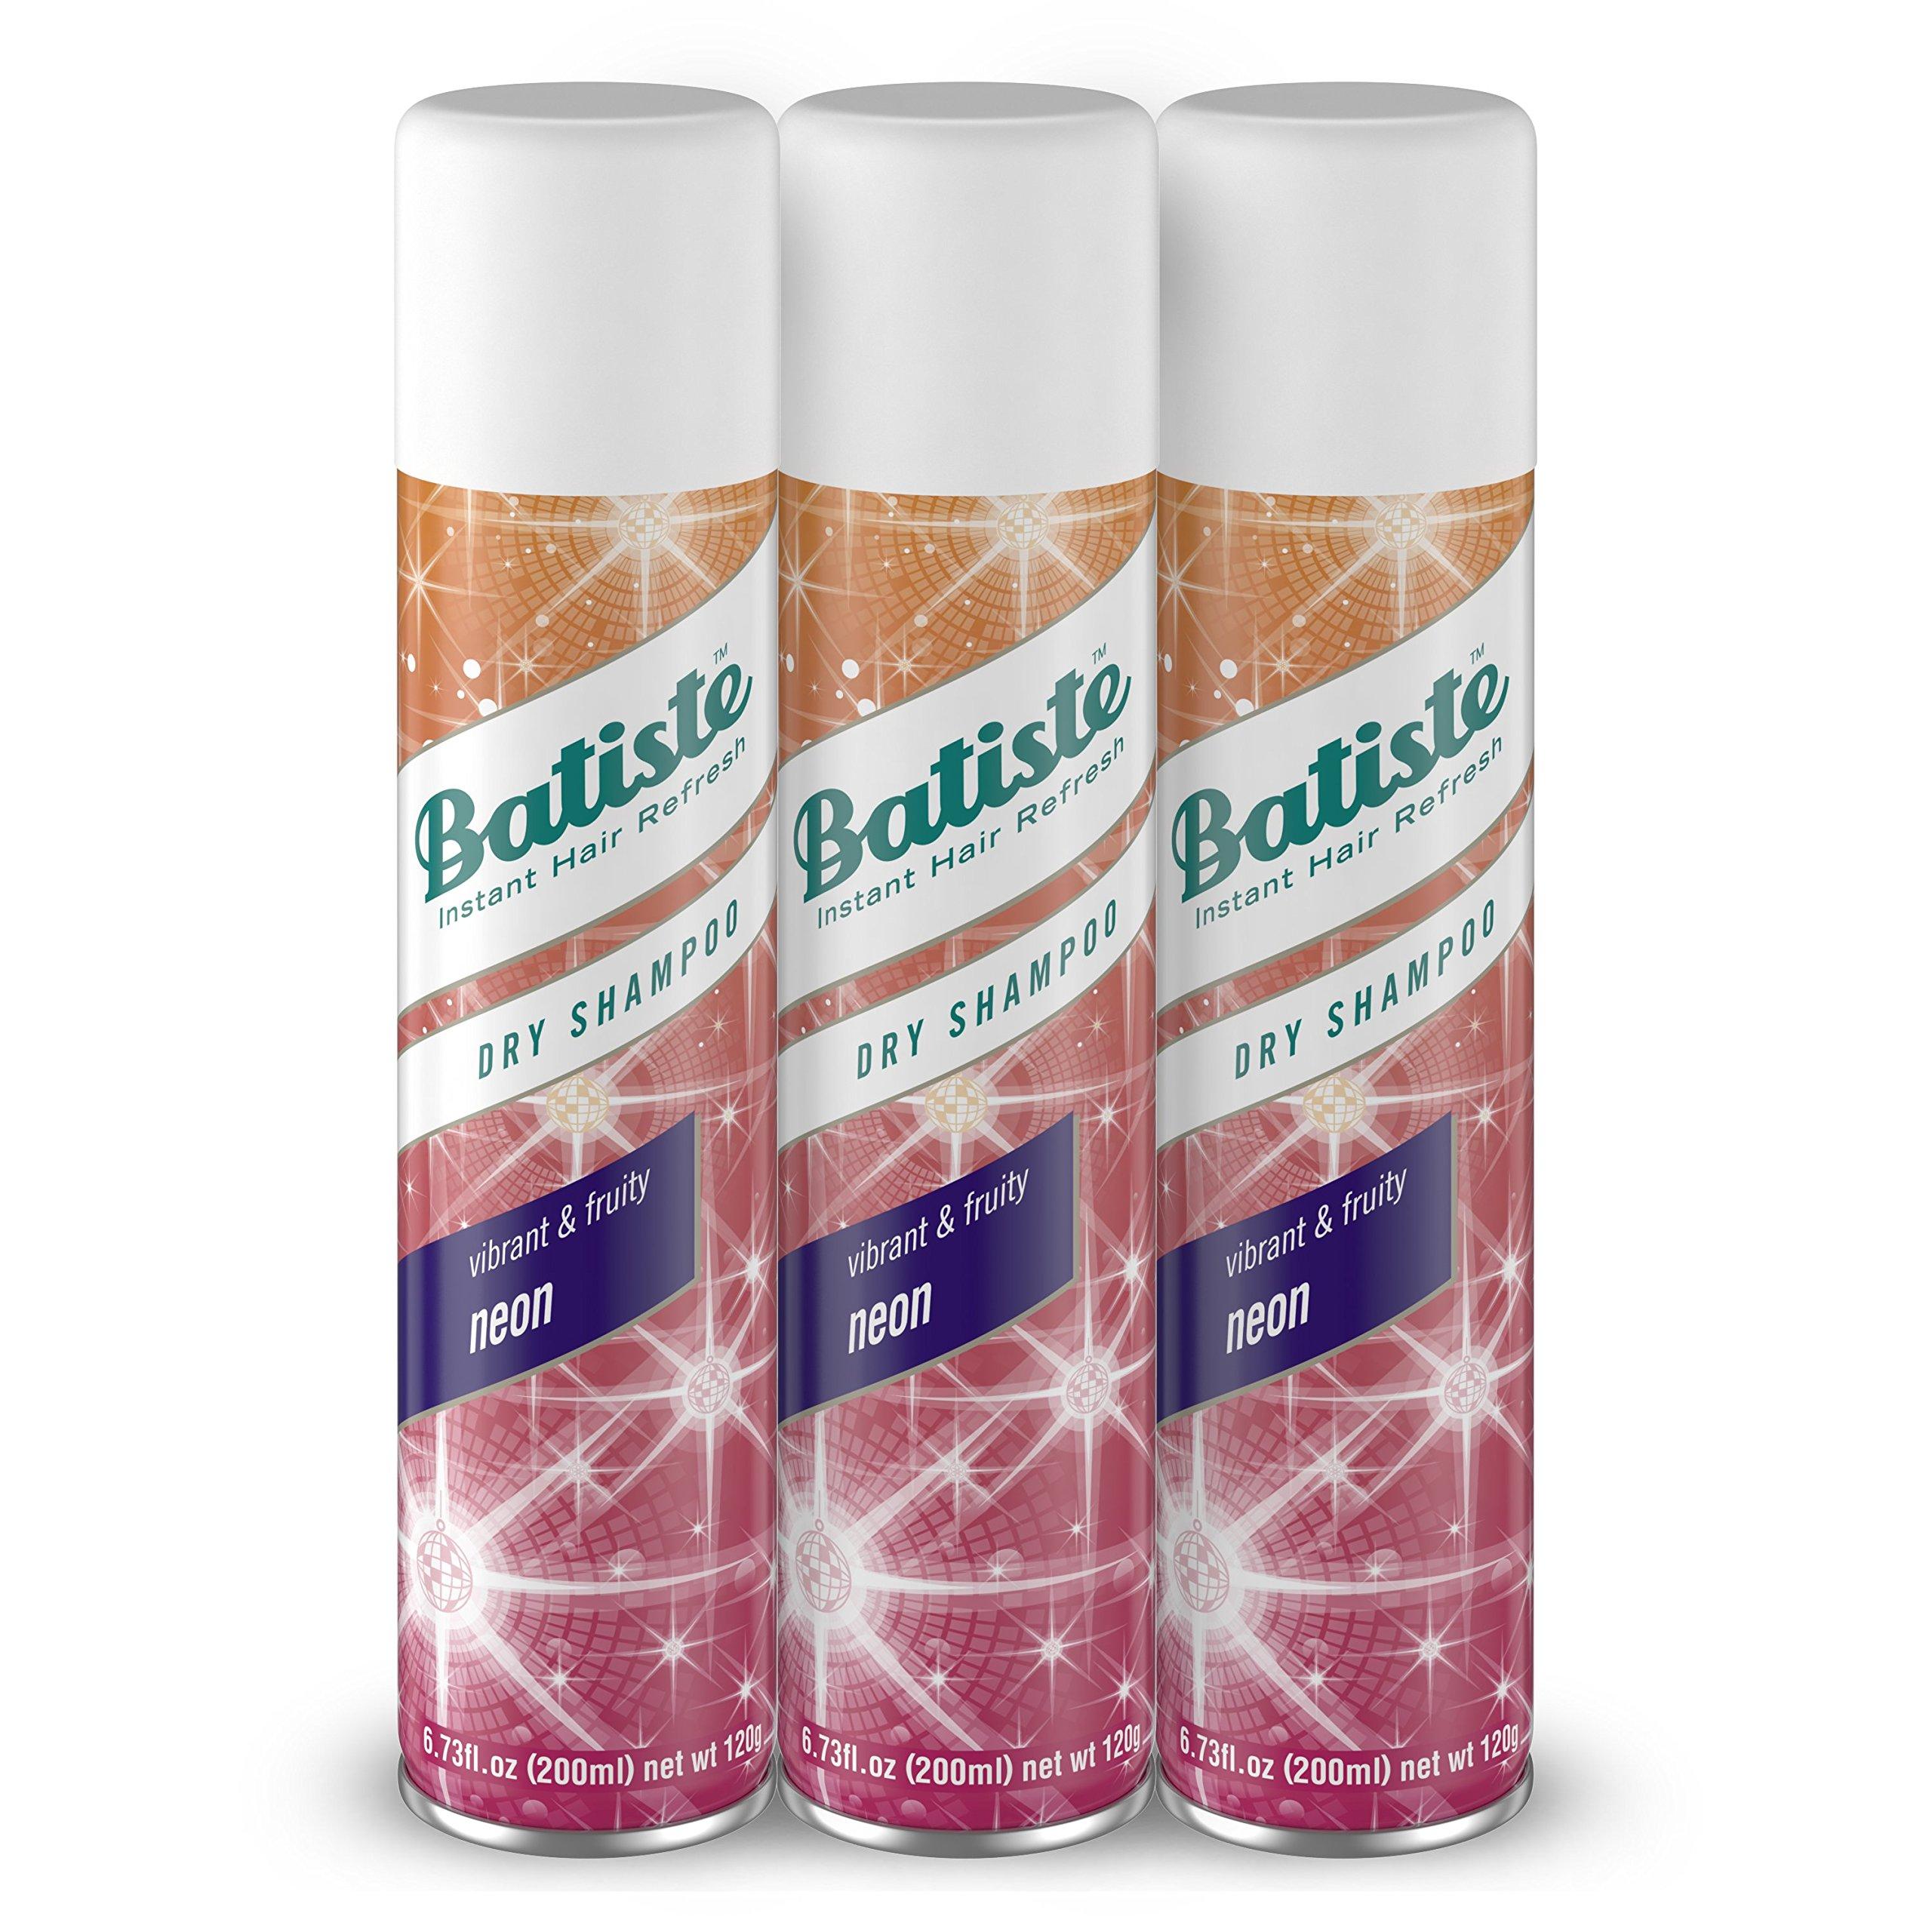 Batiste Dry Shampoo, Neon, 3 Count (Pack of 4) by Batiste